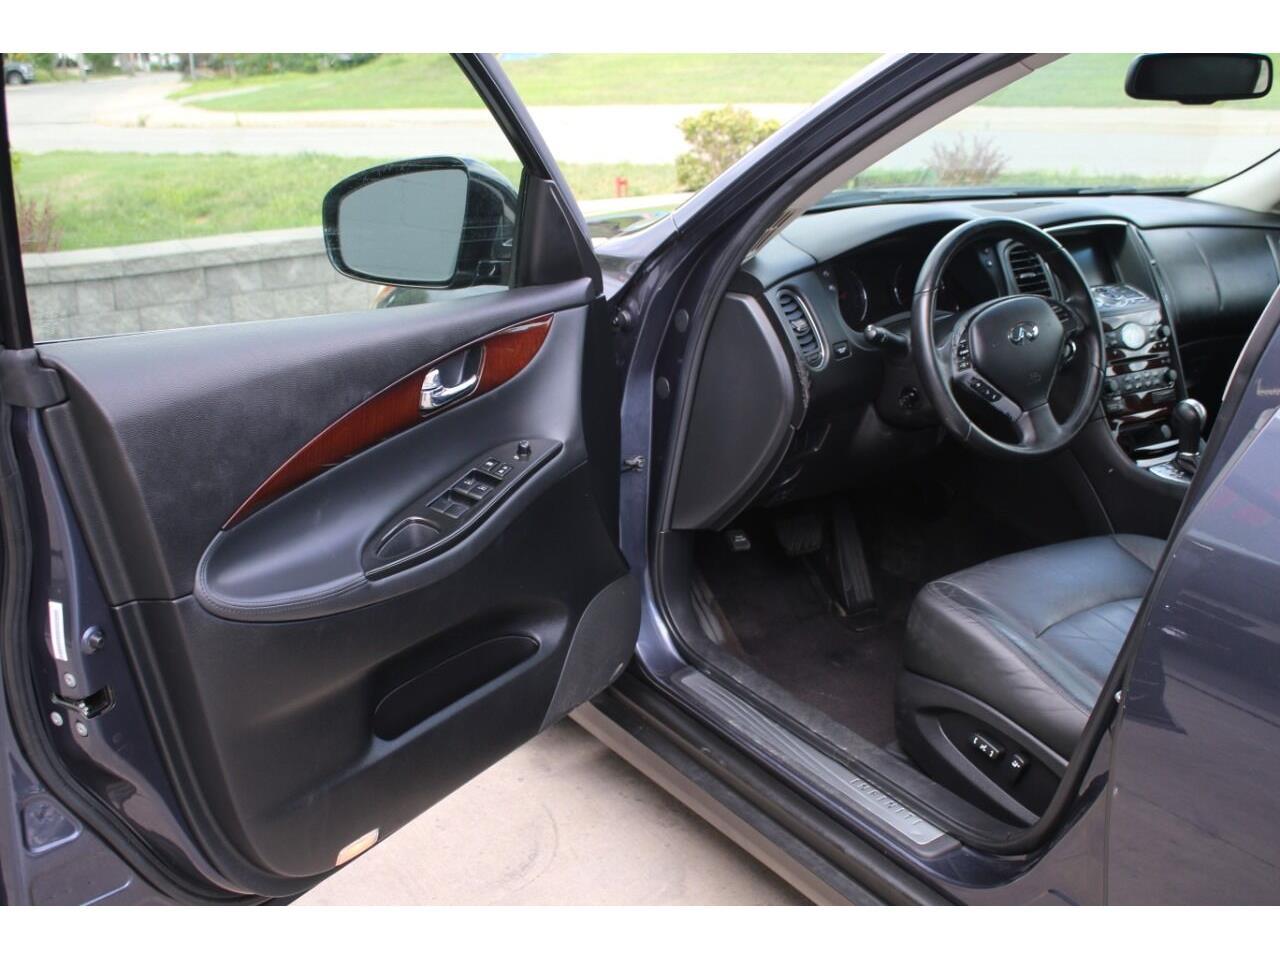 2009 Infiniti EX35 (CC-1388170) for sale in Hilton, New York